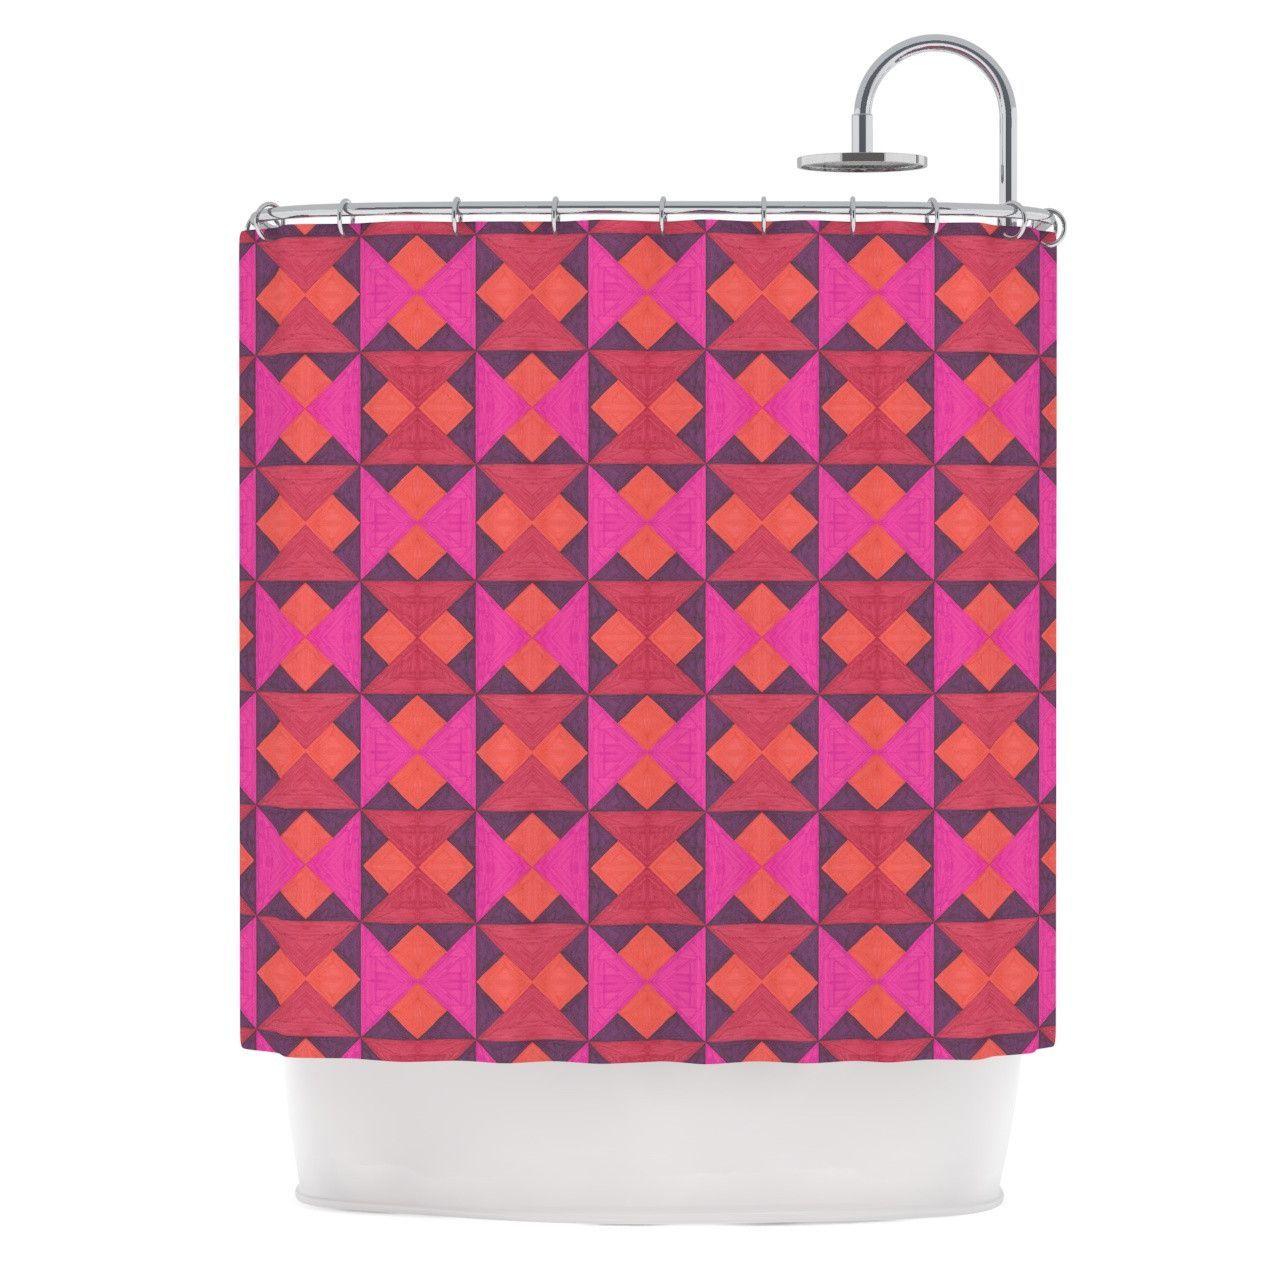 Shower curtain quilt pattern - Empire Ruhl A Quilt Pattern Pink Red Shower Curtain